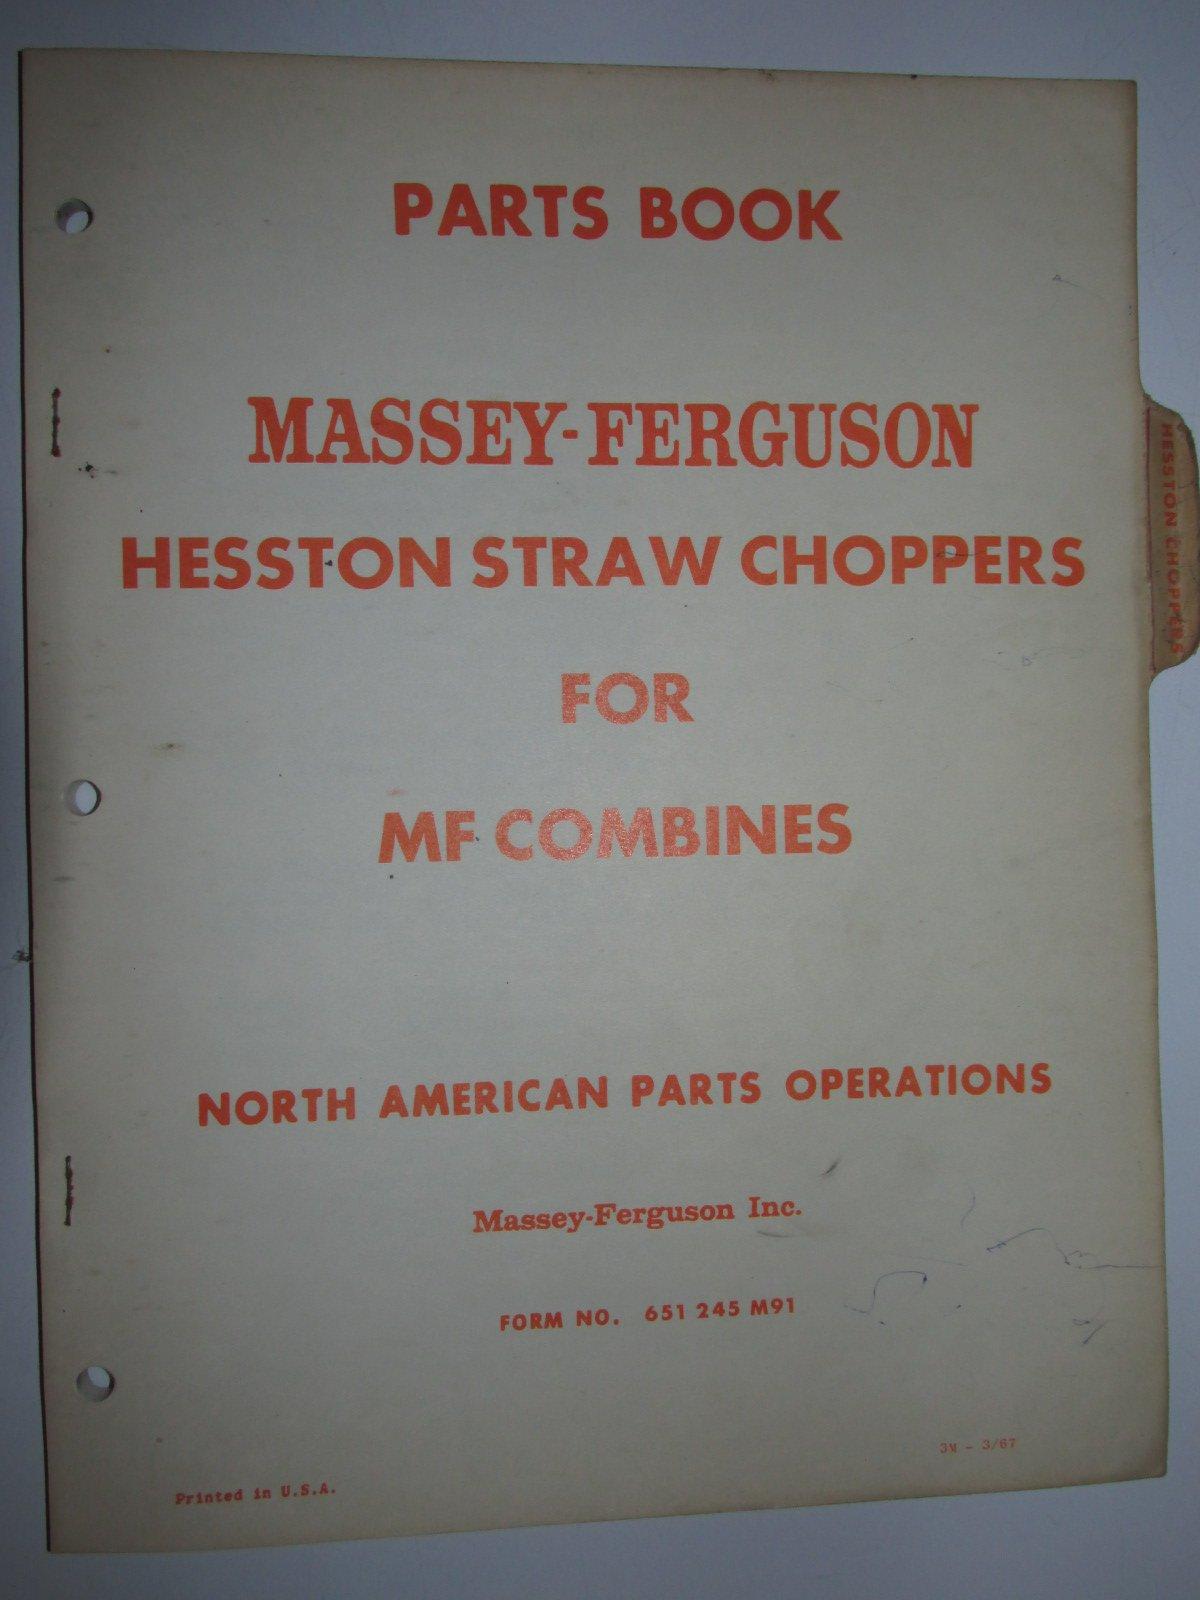 Massey Ferguson Hesston Straw Choppers for MF Combines Parts